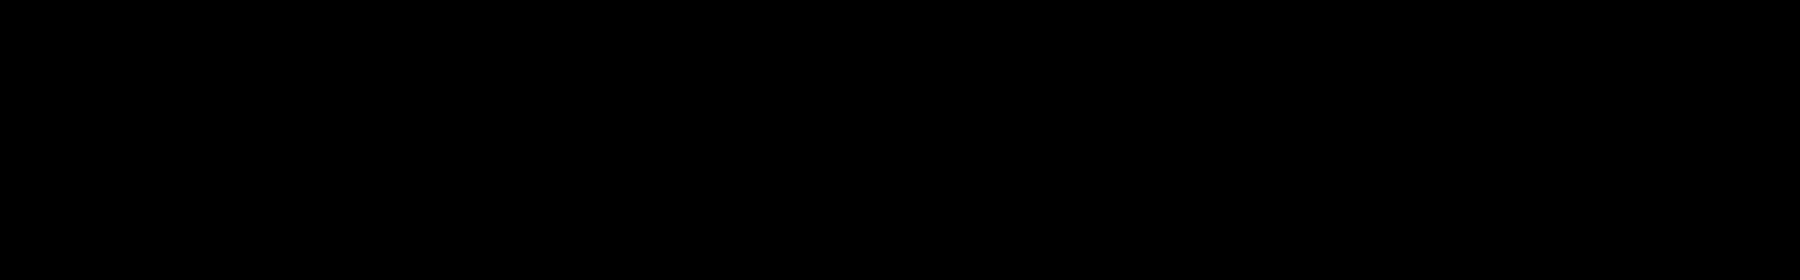 Hybrid Trap by Eurotrvsh - NI MASSIVE audio waveform